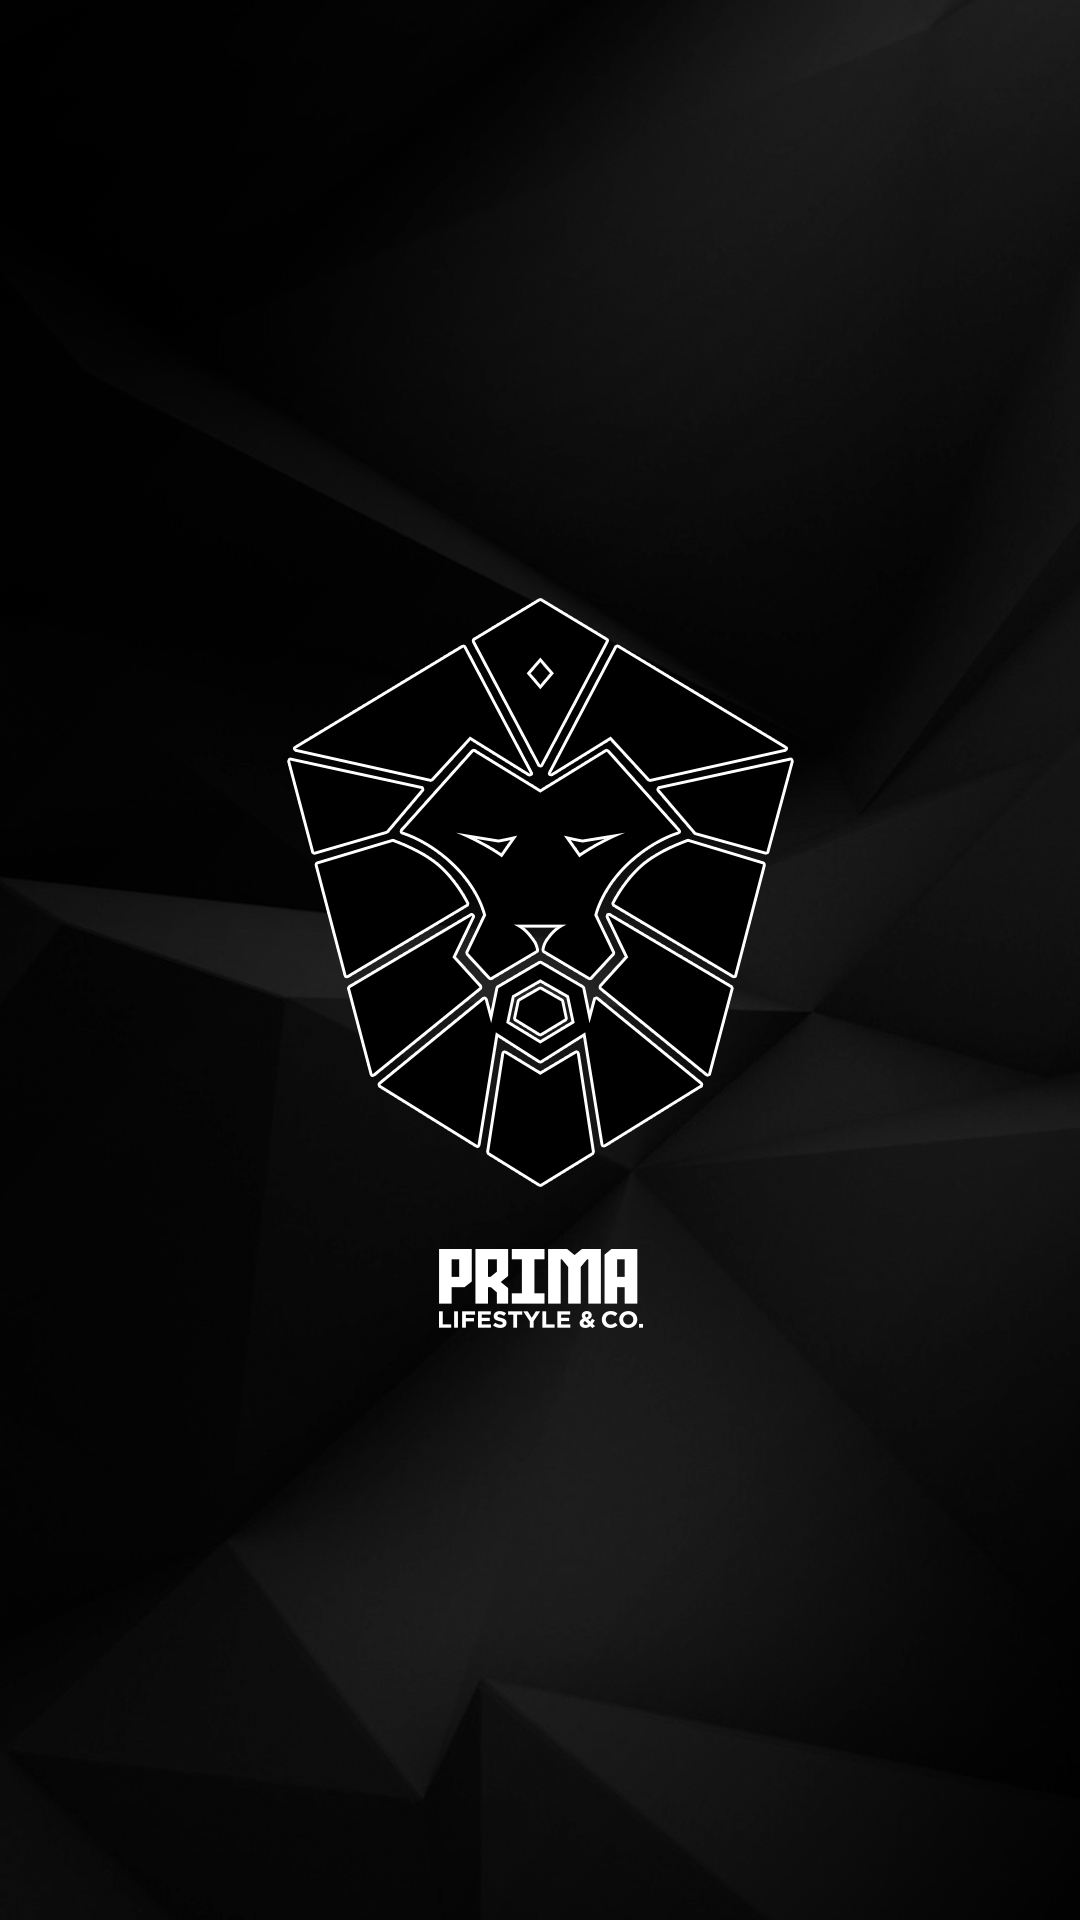 PRIMA_Lifestyle_bg3.jpg